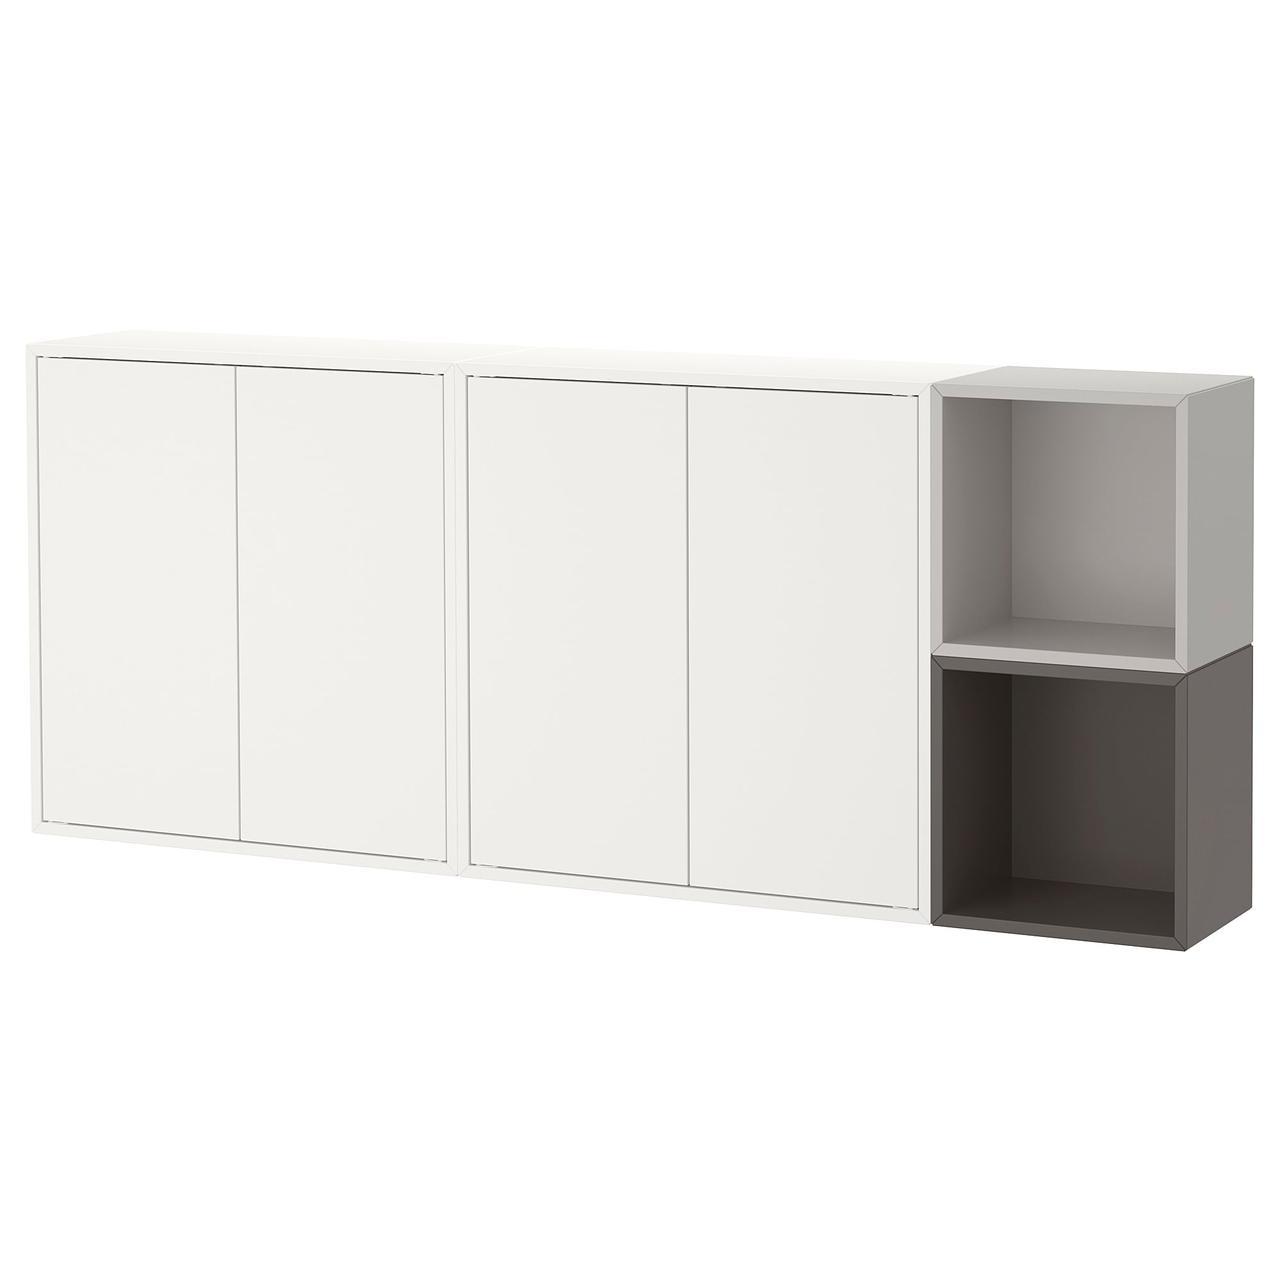 EKET Комбинация шкафов настенных